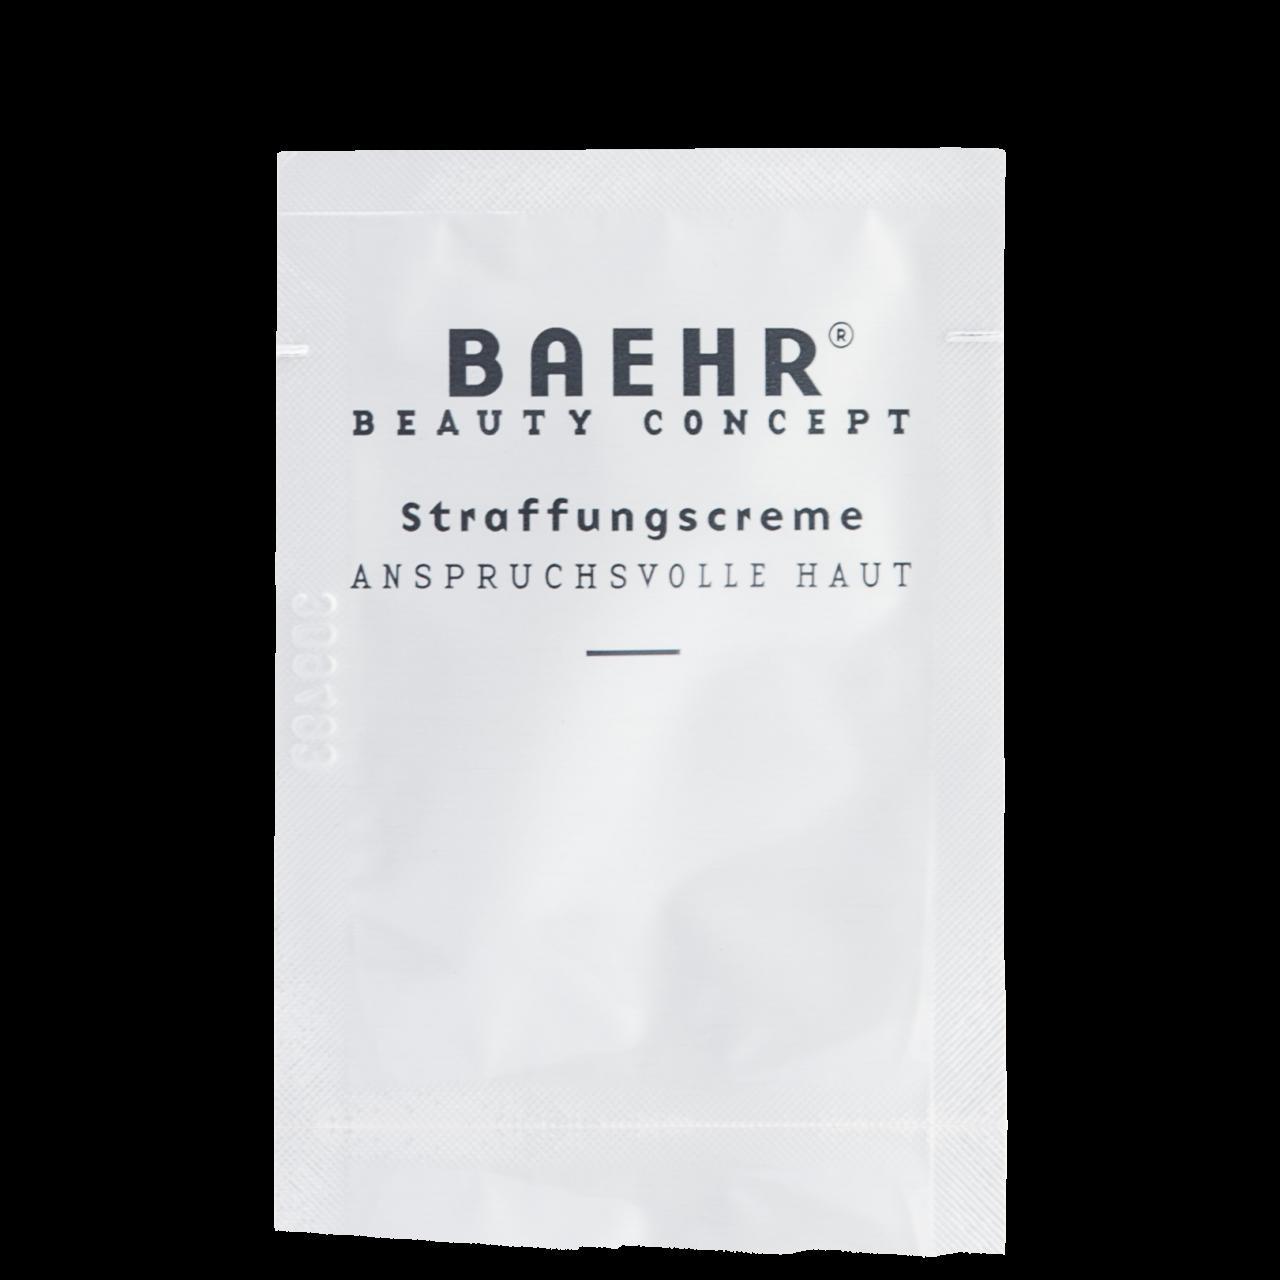 Straffungscreme Probe (Sachet) Sachet